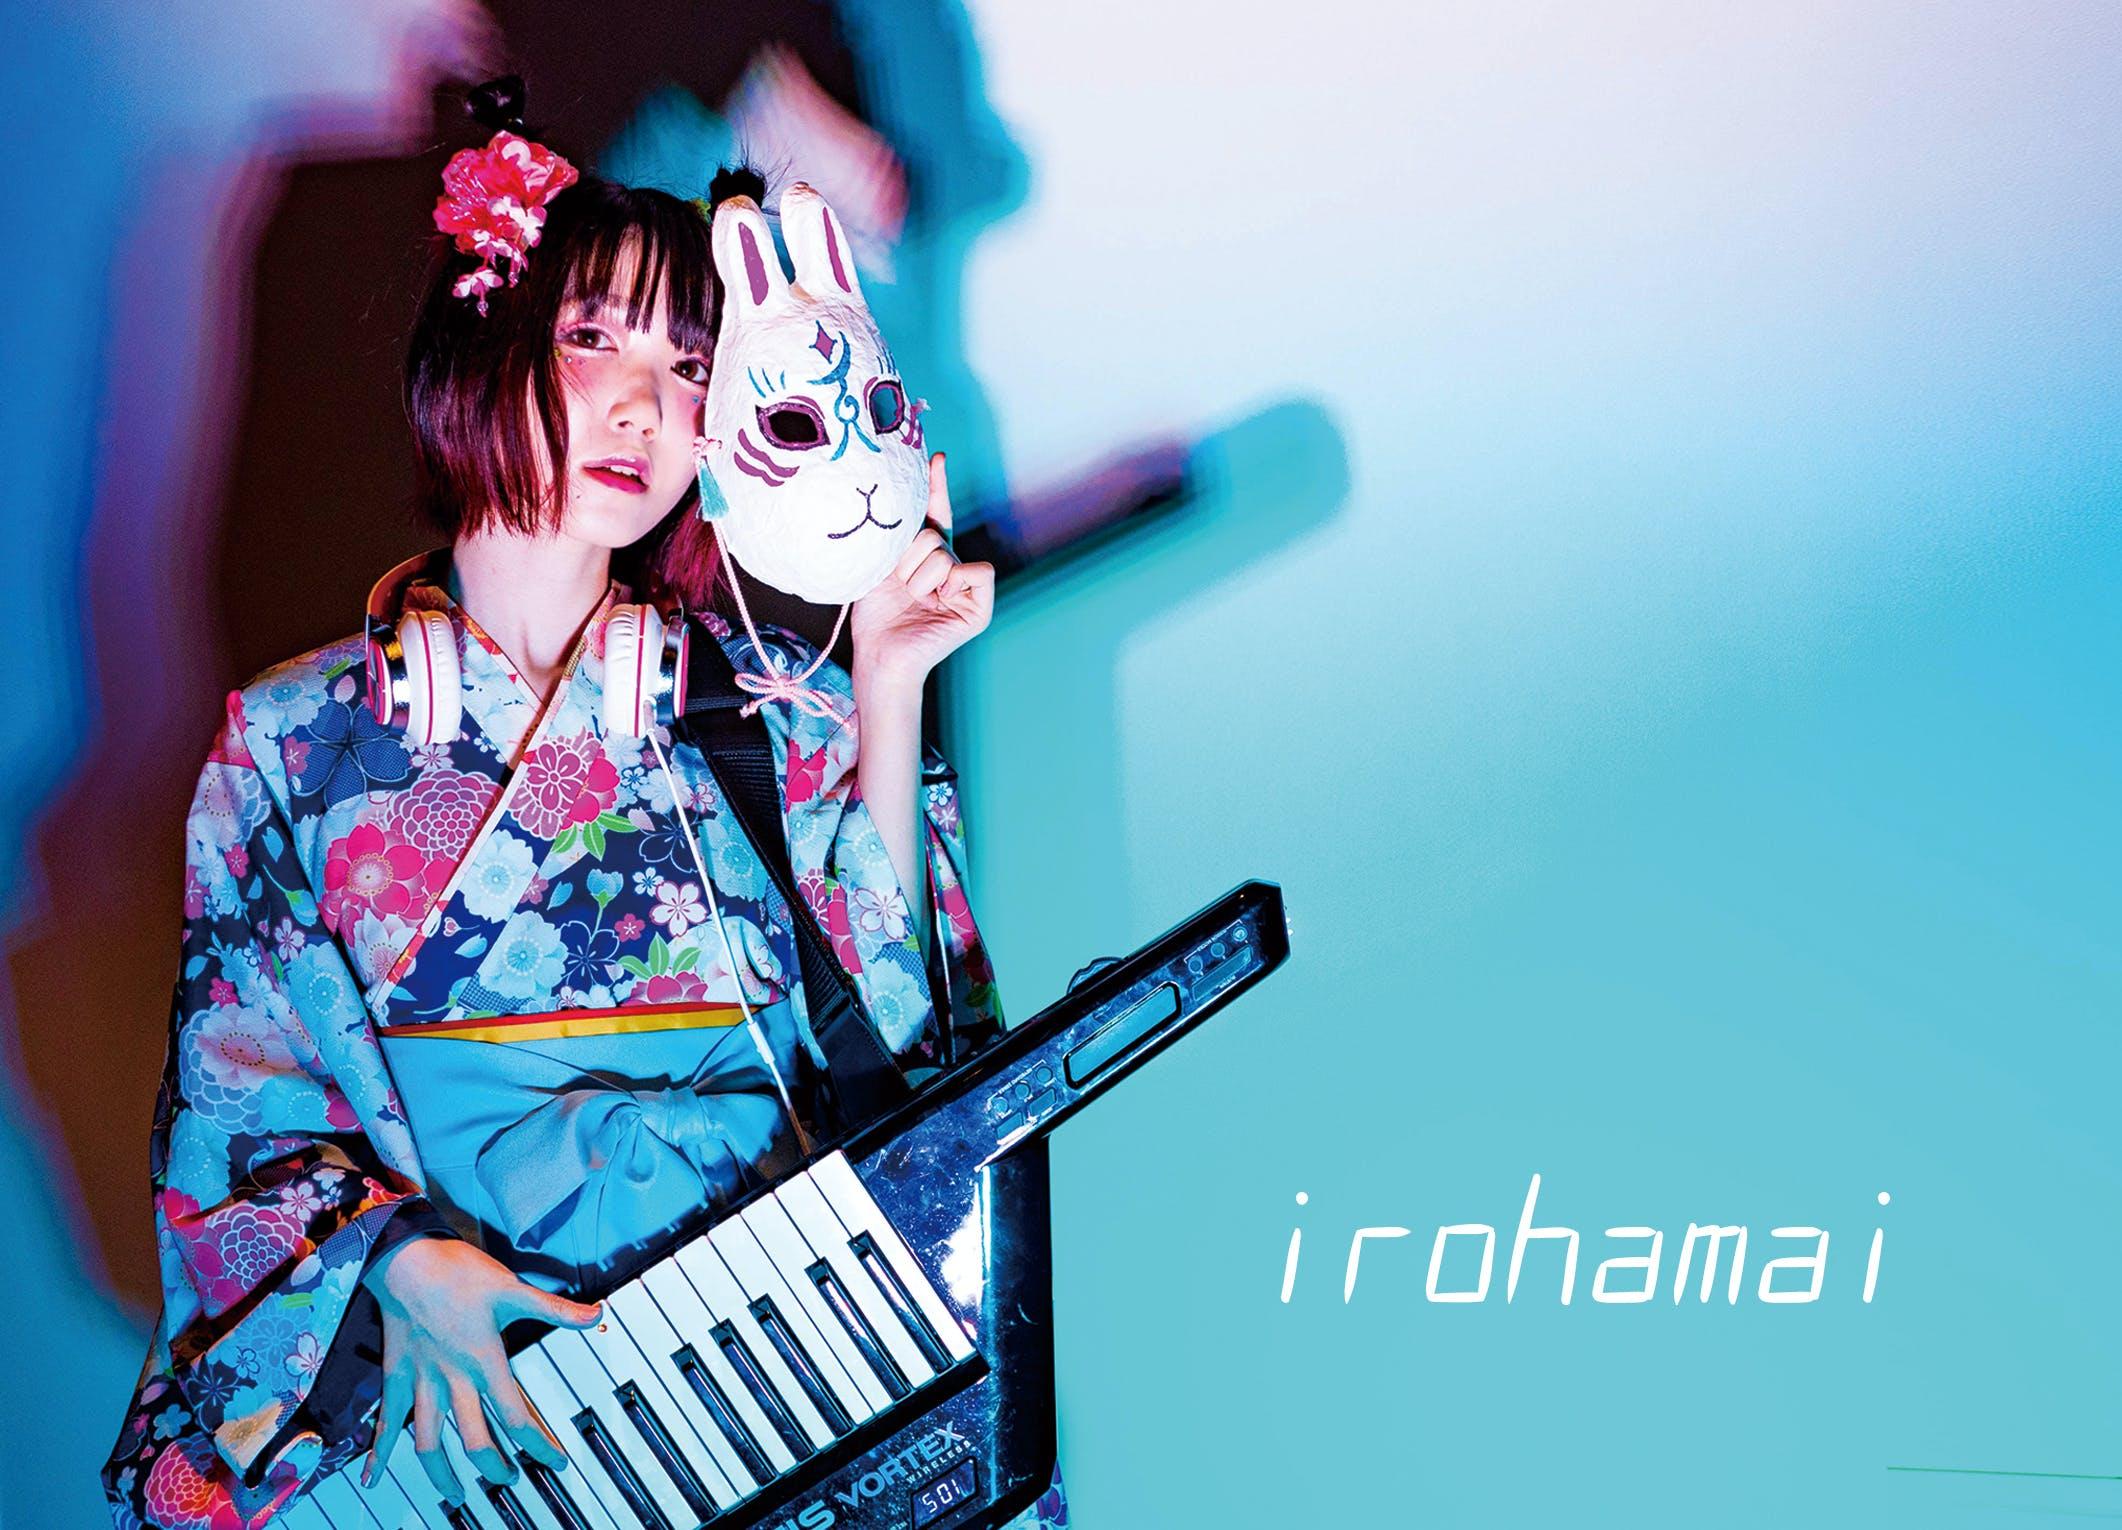 Irohamai 2018 11.jpg?ixlib=rails 2.1